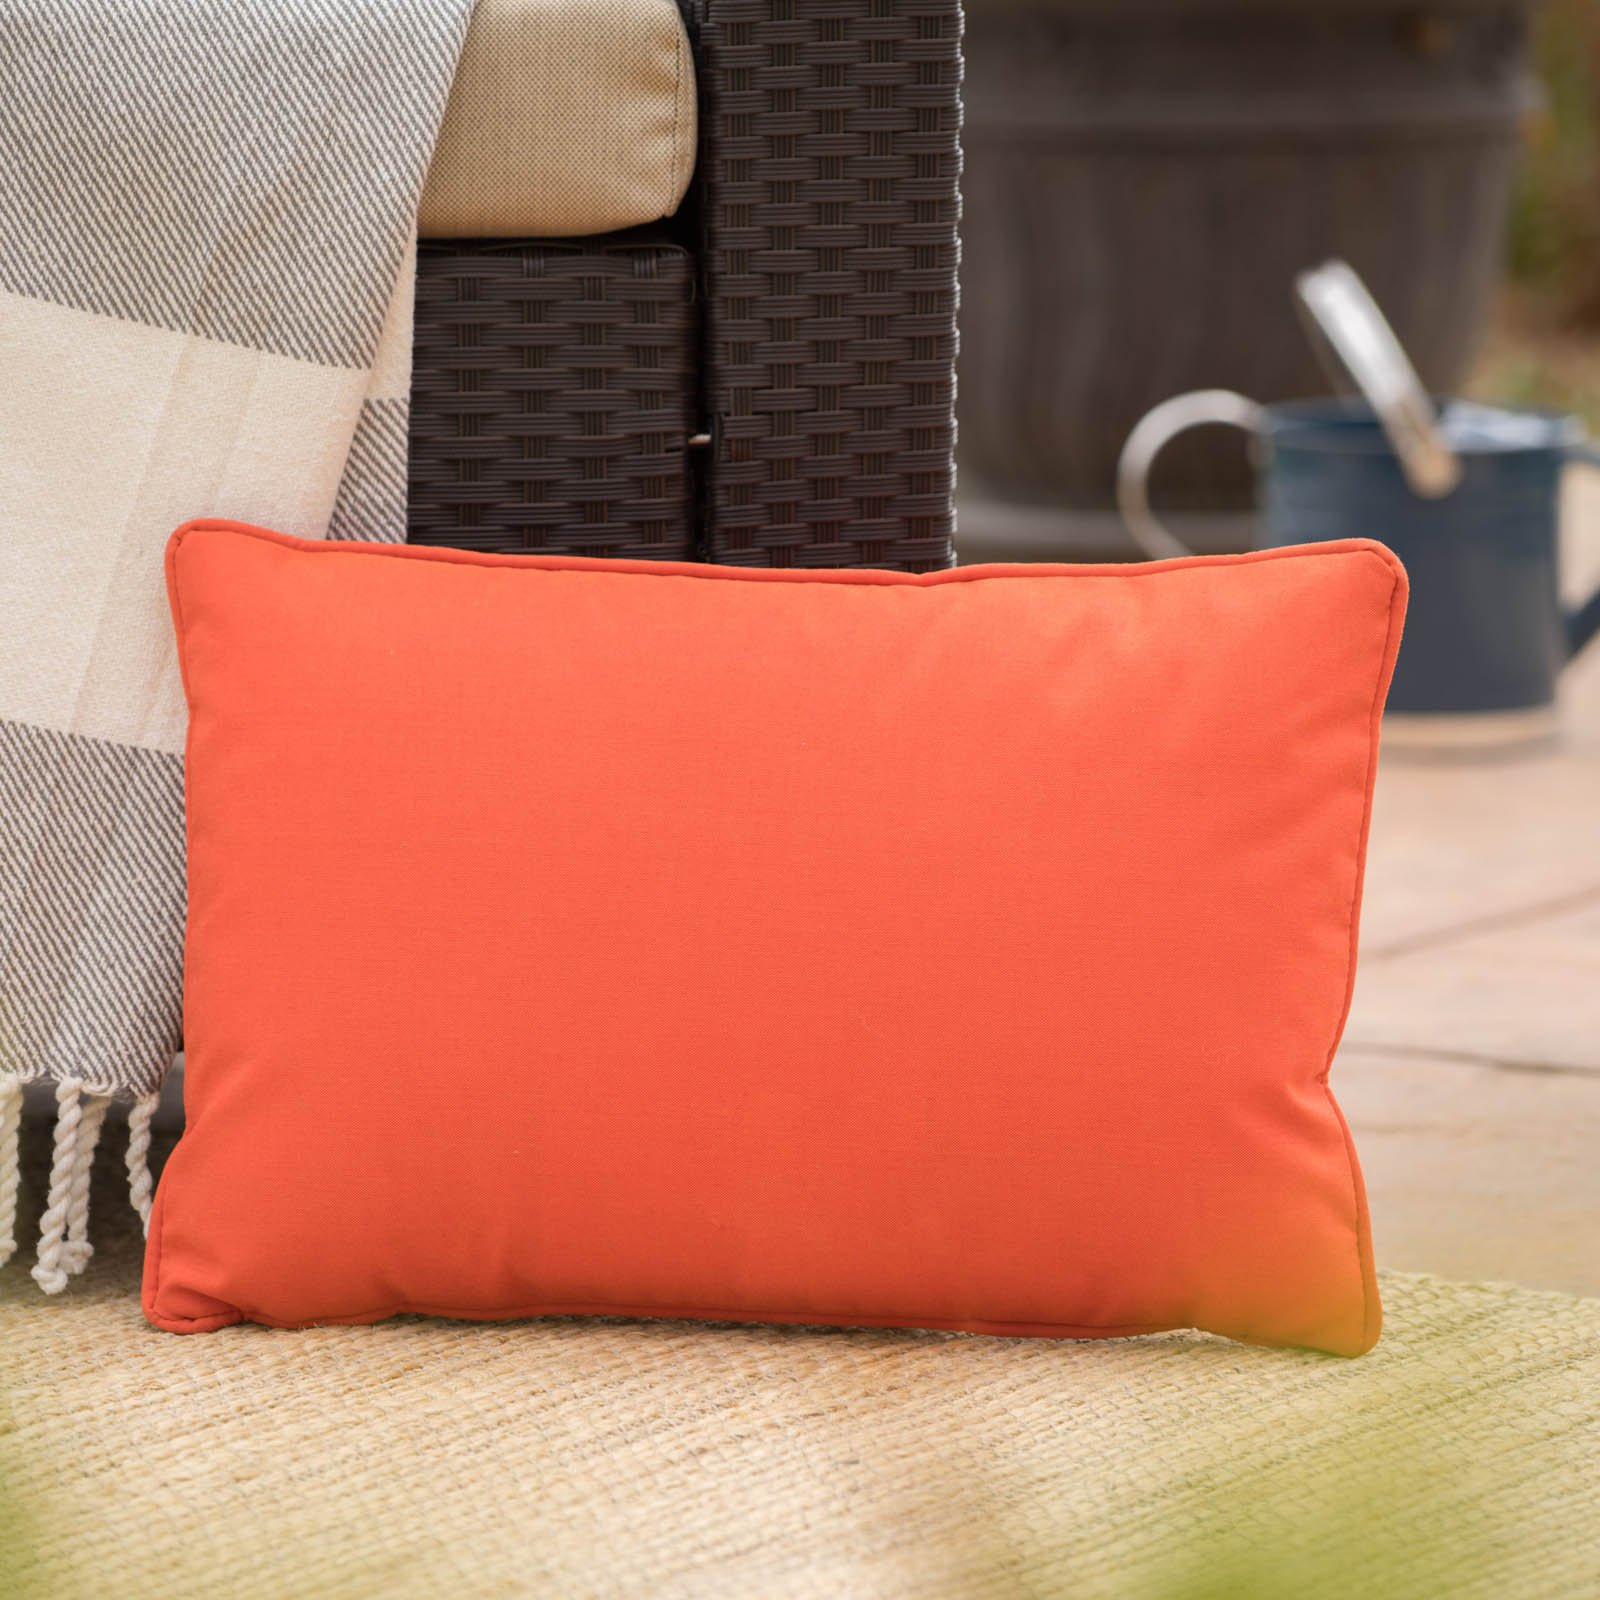 Coronado Outdoor Rectangular Water Resistant Pillow